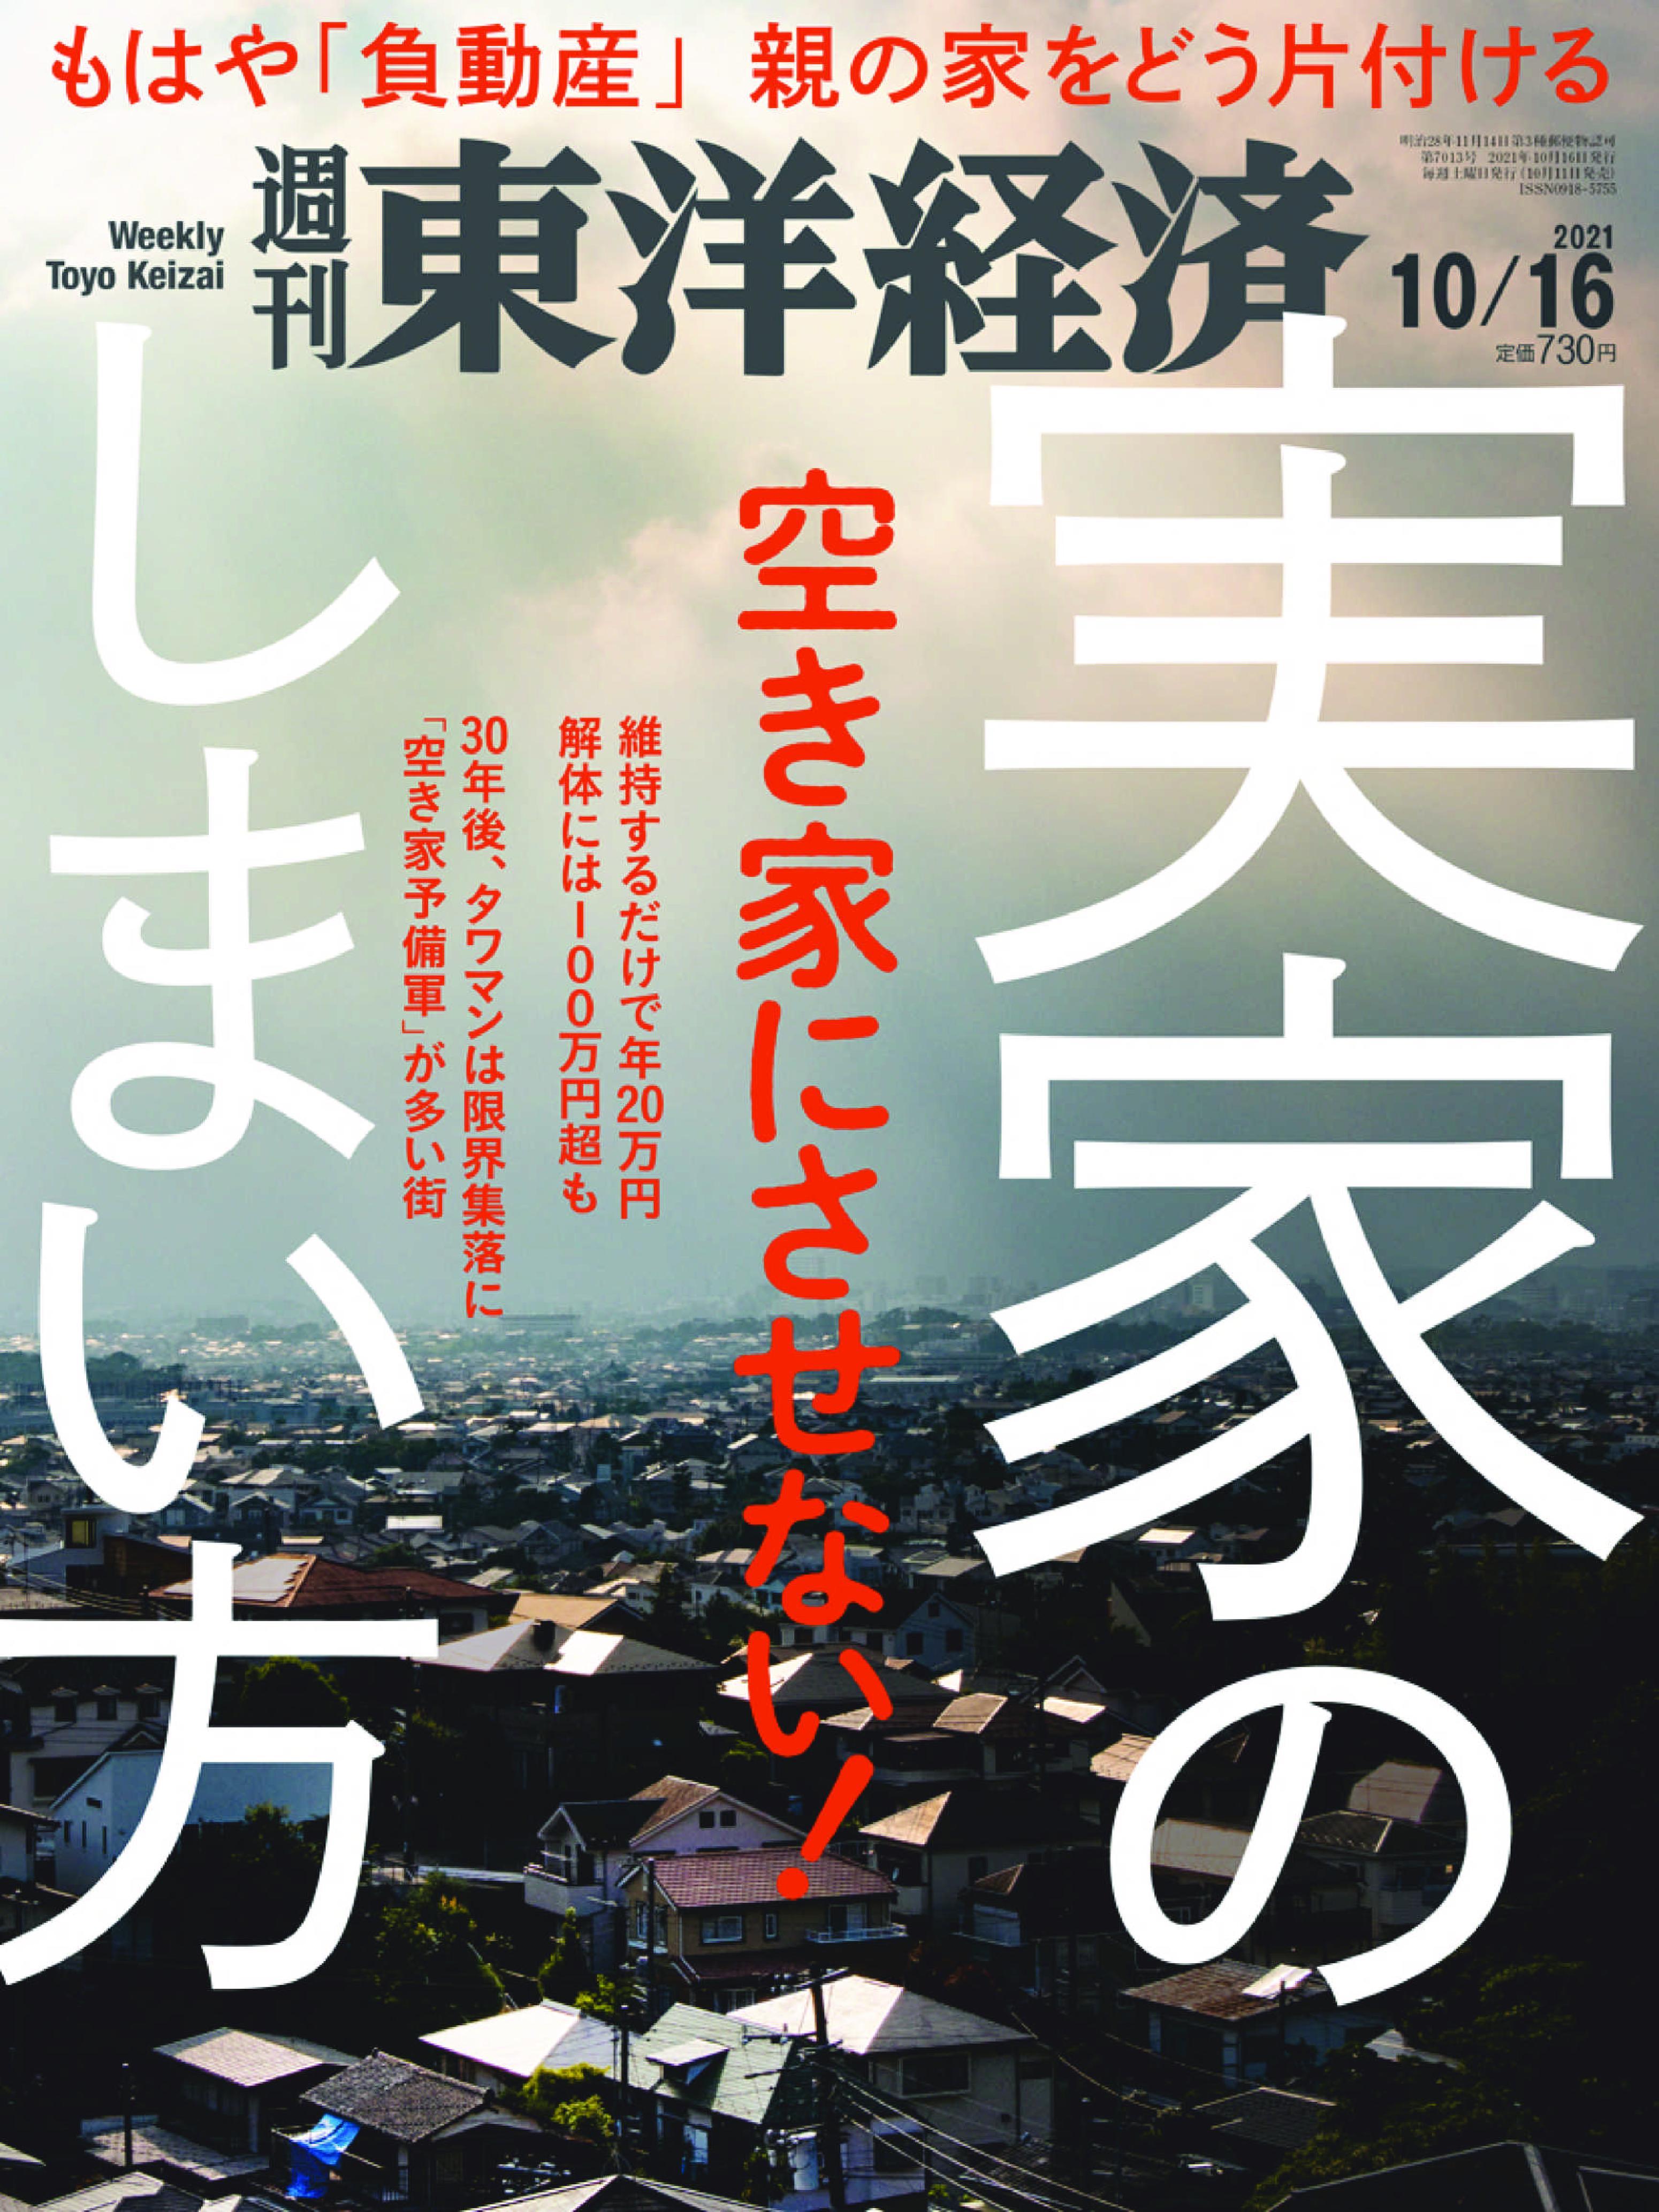 Weekly Toyo Keizai 週刊東洋経済 - 11 10月 2021